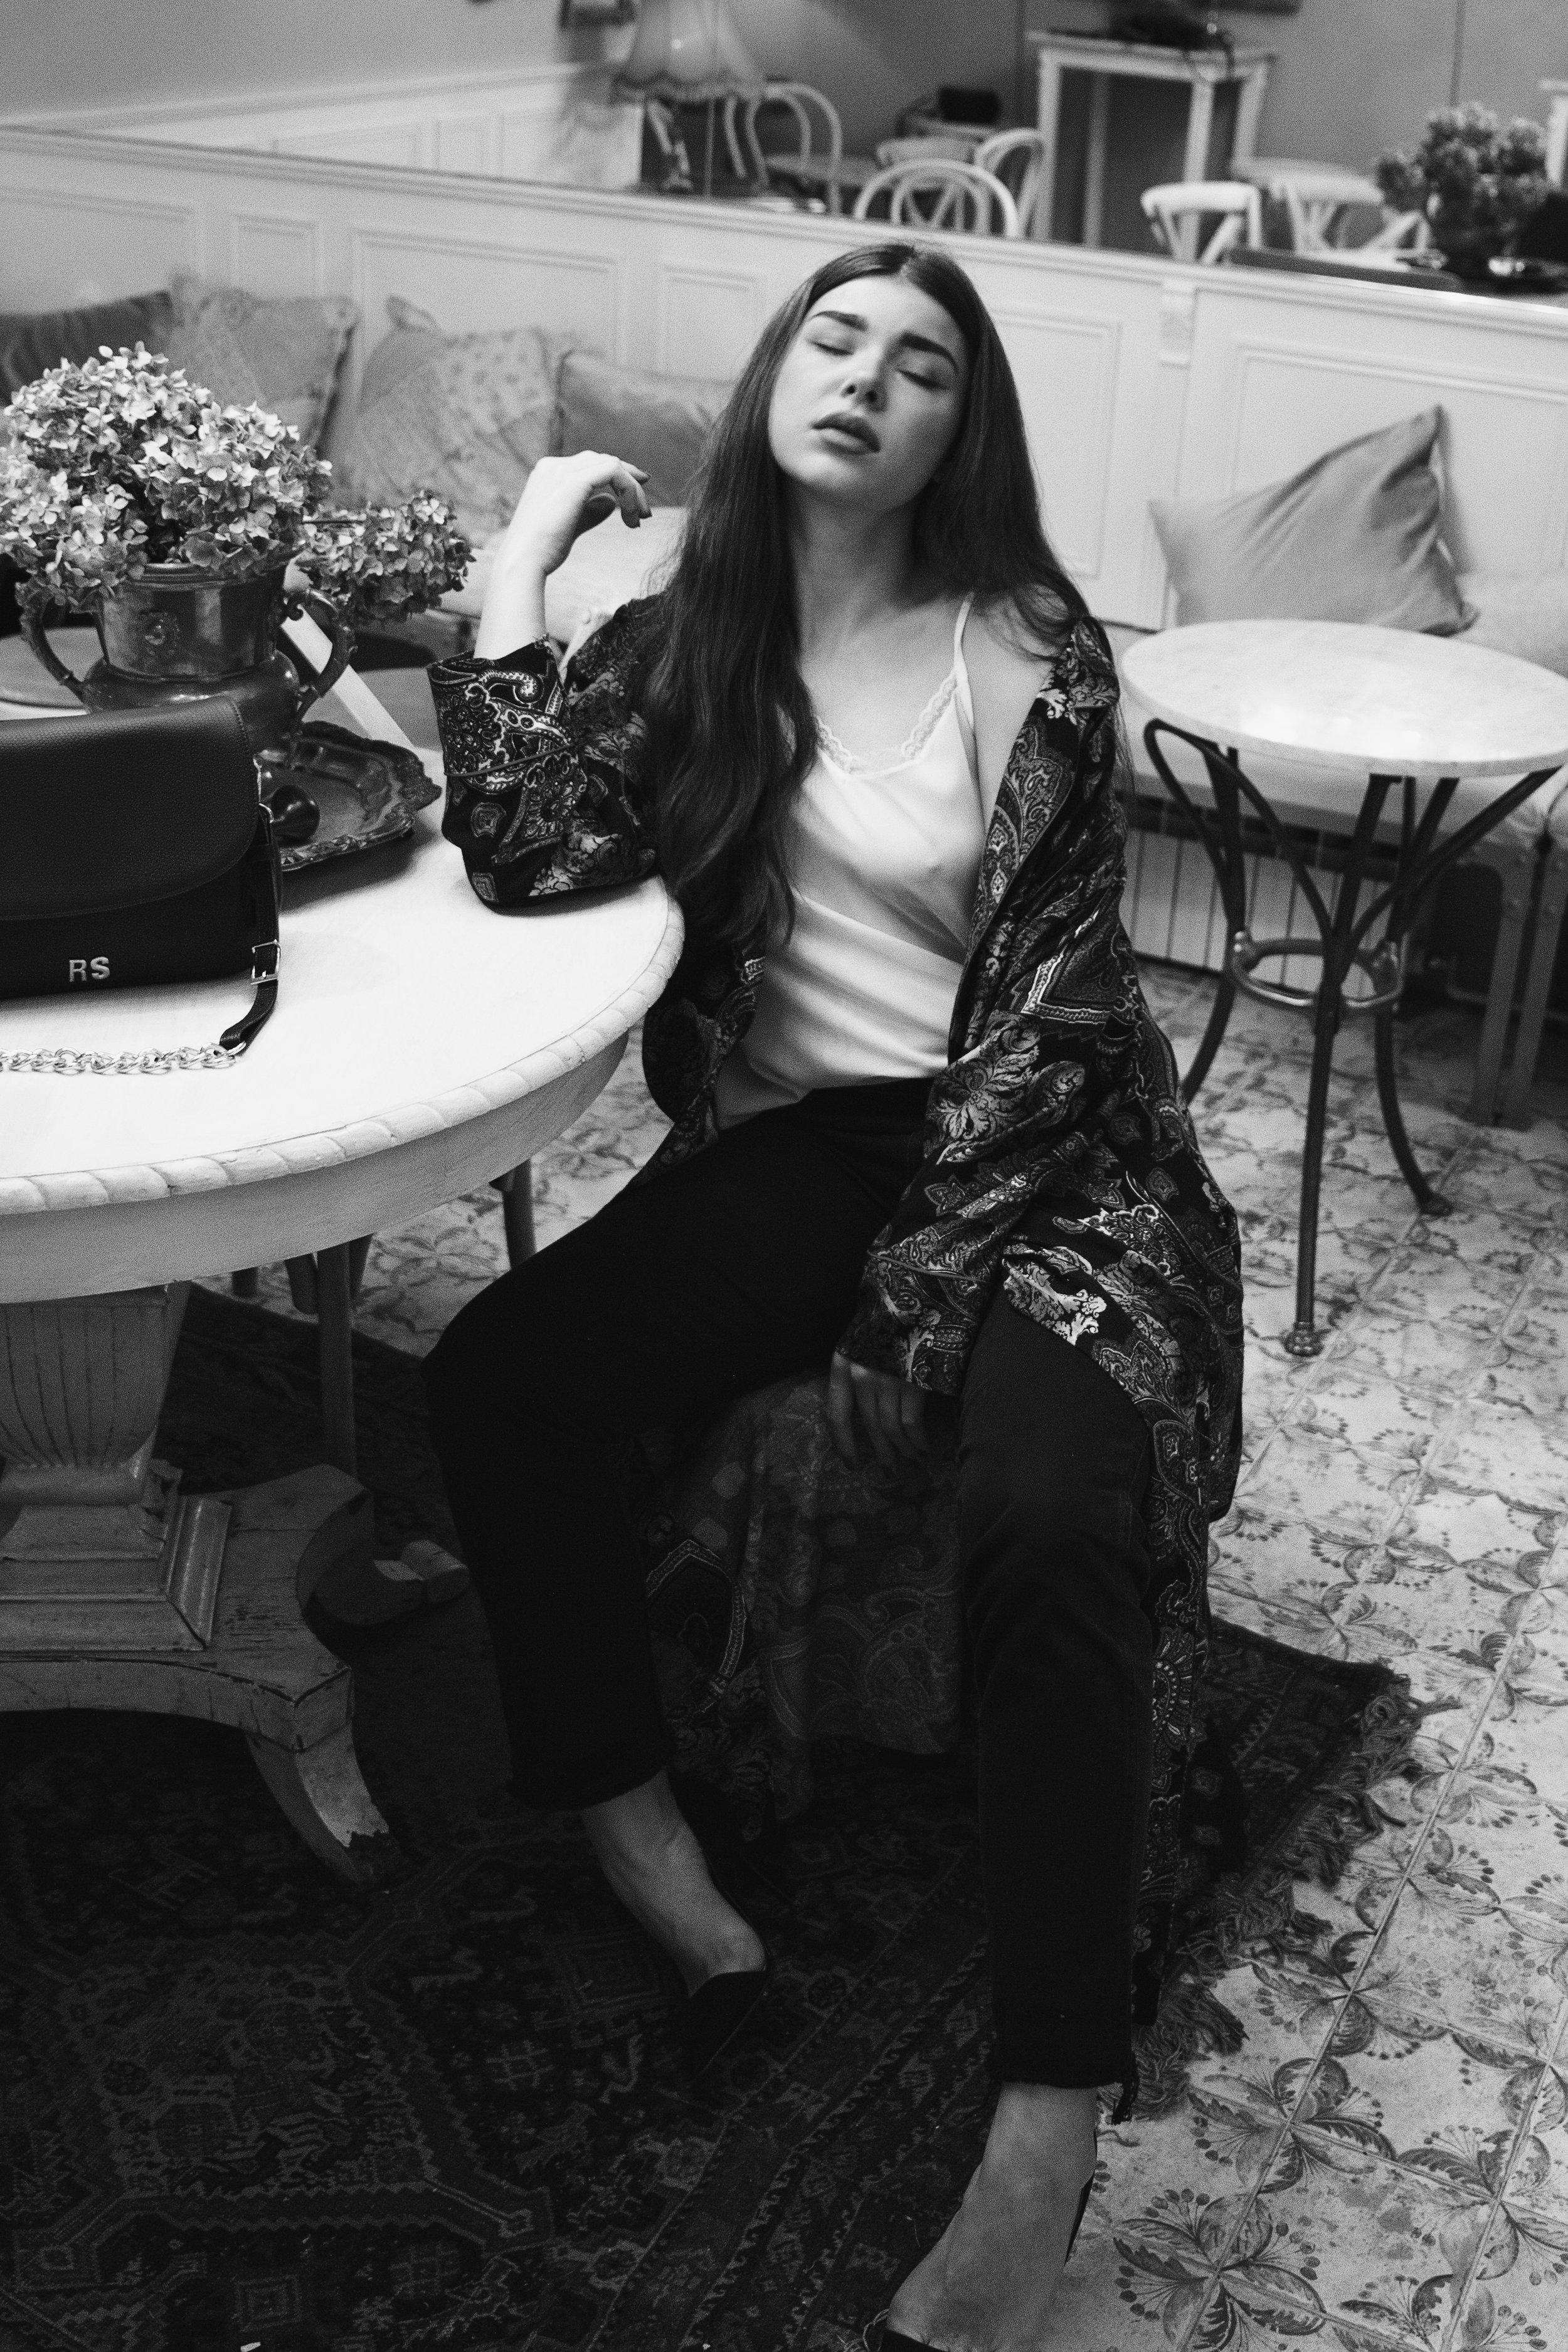 fashion-editorial-robert-sever-caffe-bar-finjak-expensive-reality-fashion-photography (9).jpg